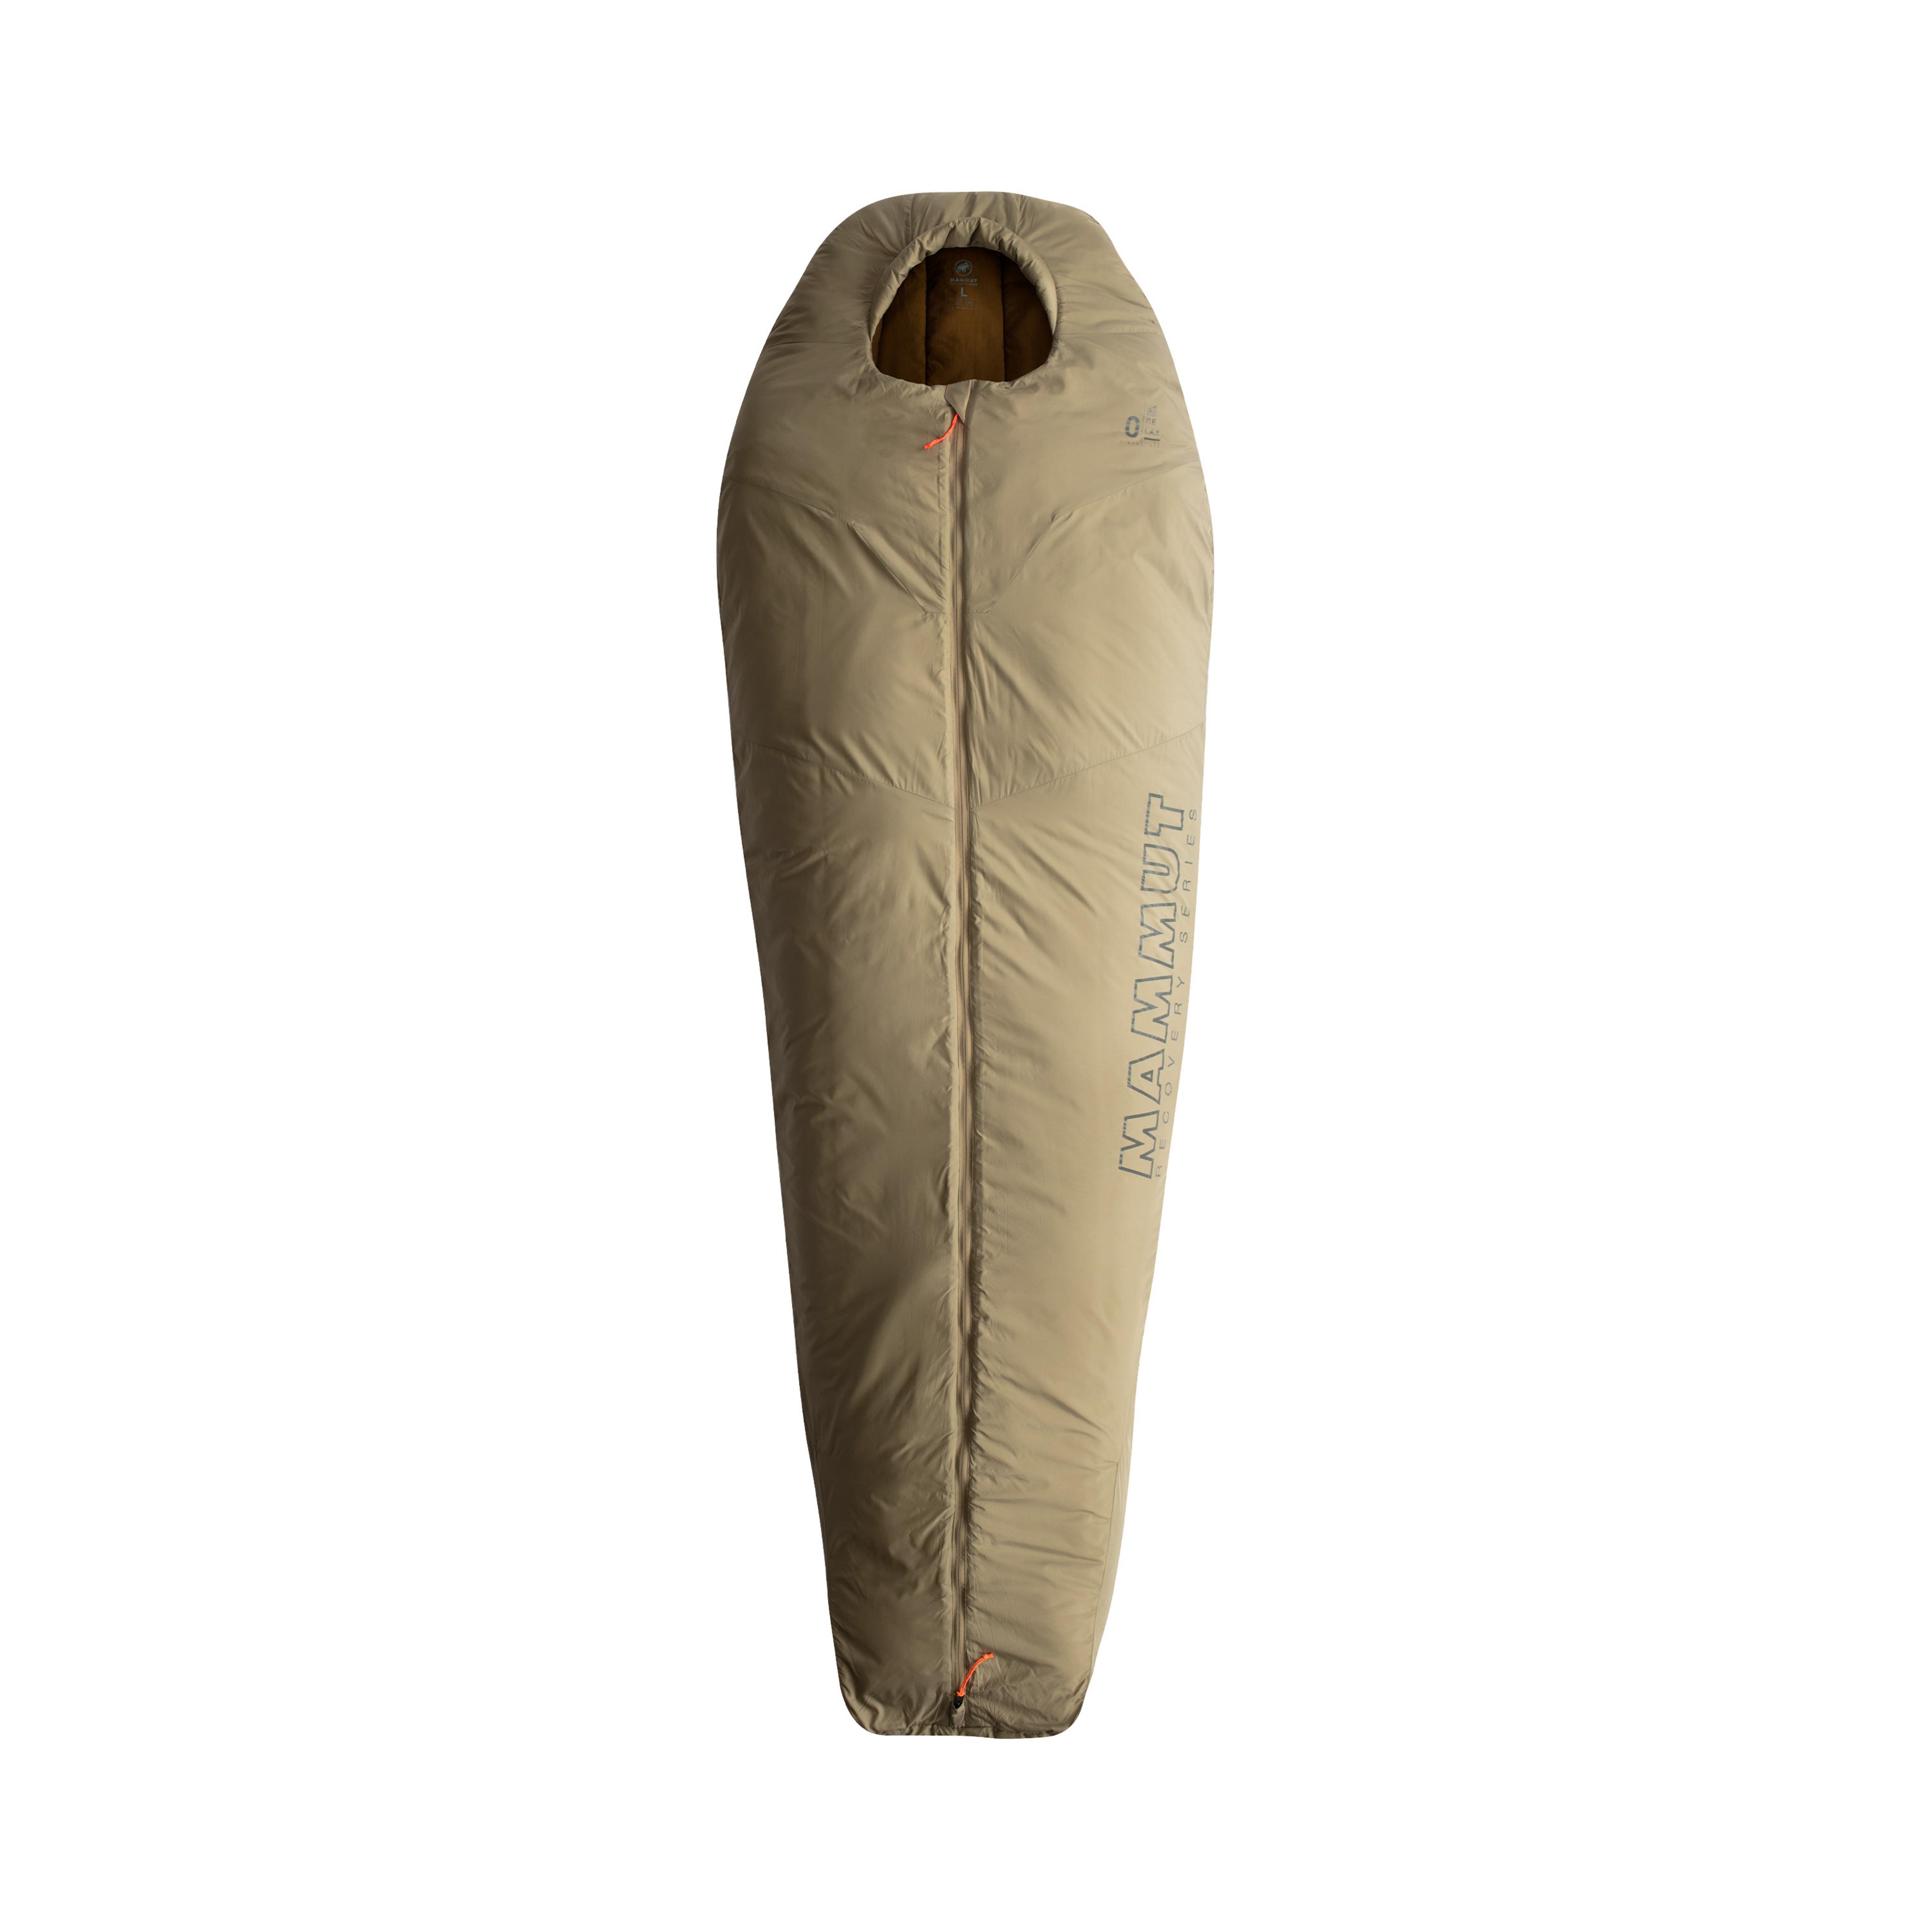 Relax Fiber Bag 0C - L, neutral, olive thumbnail